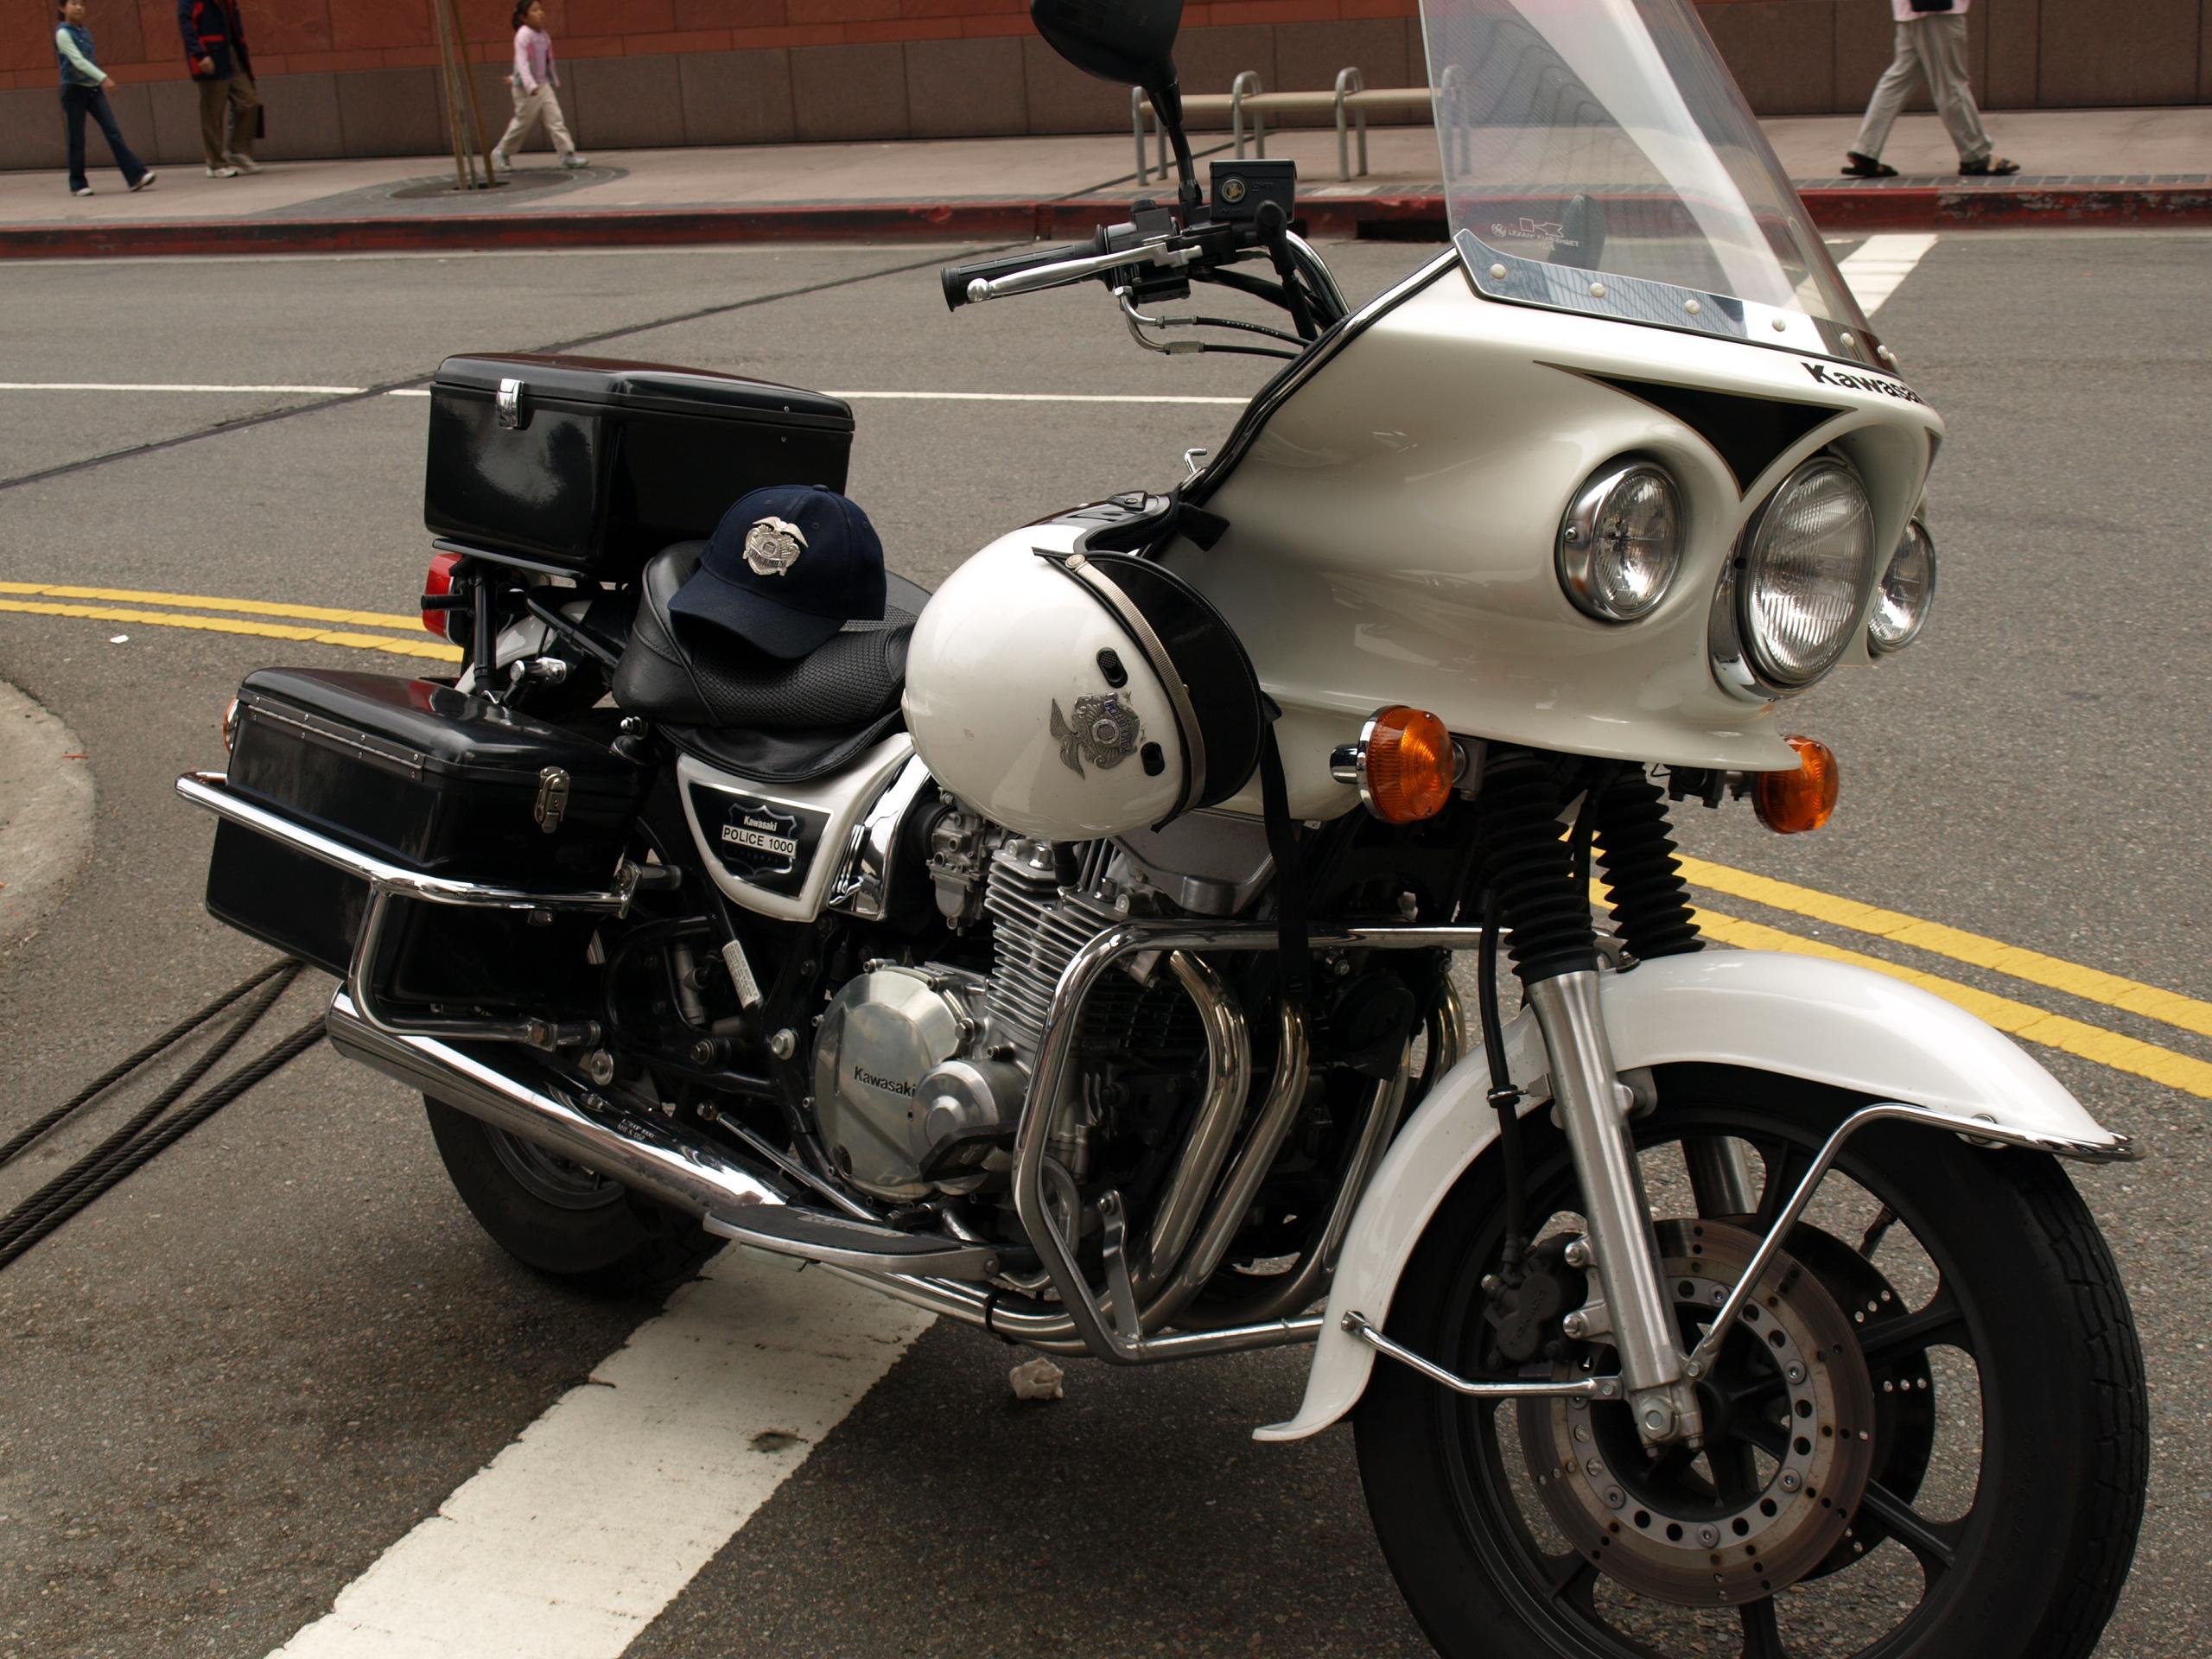 Kawasaki Kz Police Bikes Chin On The Tank Motorcycle Stuff In